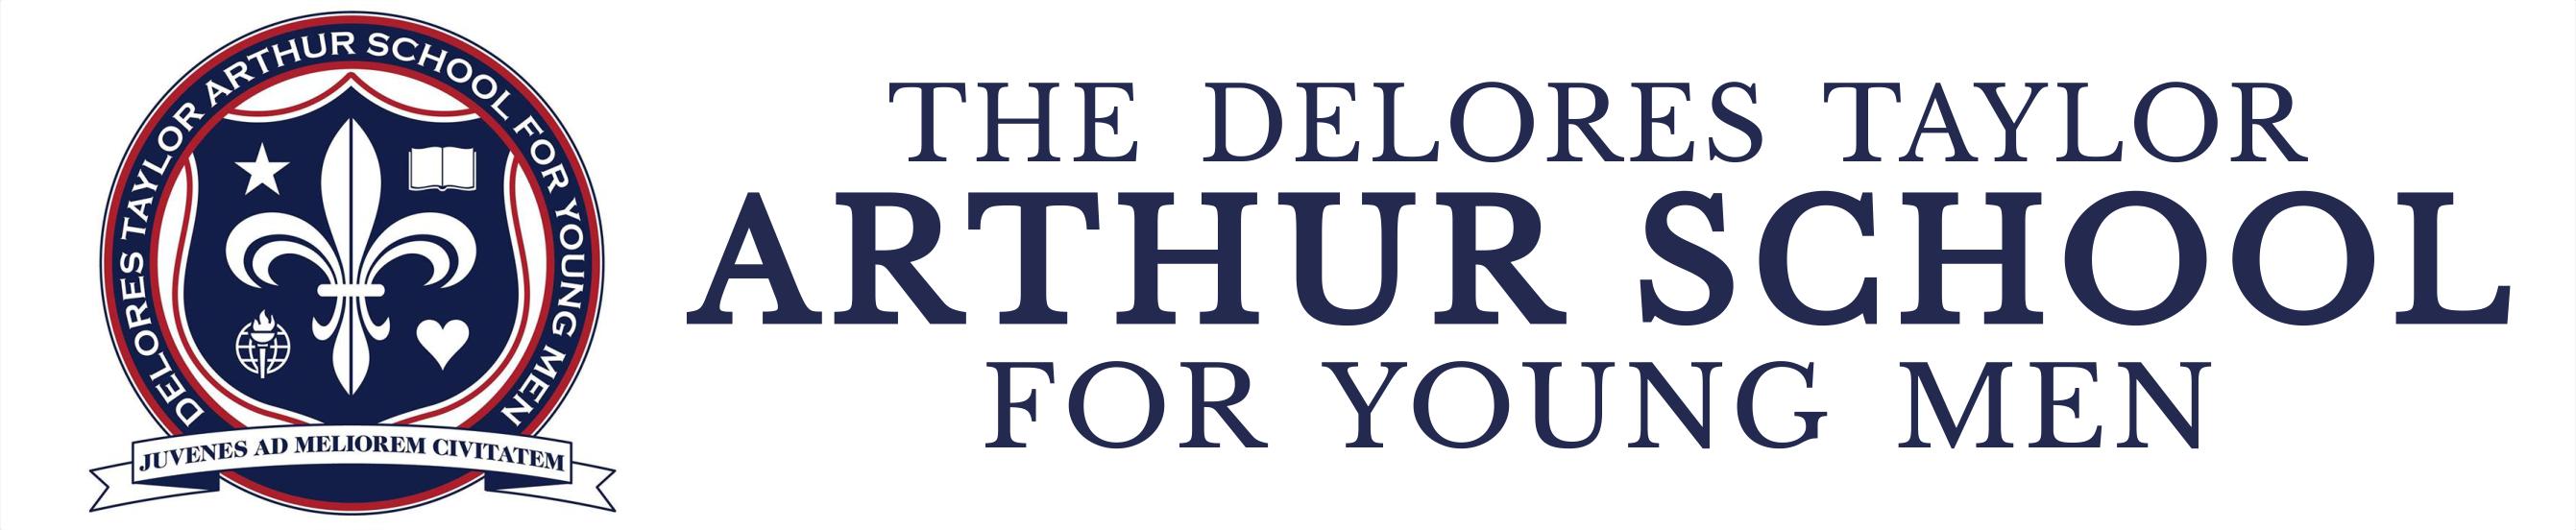 Arthur School Name with logo